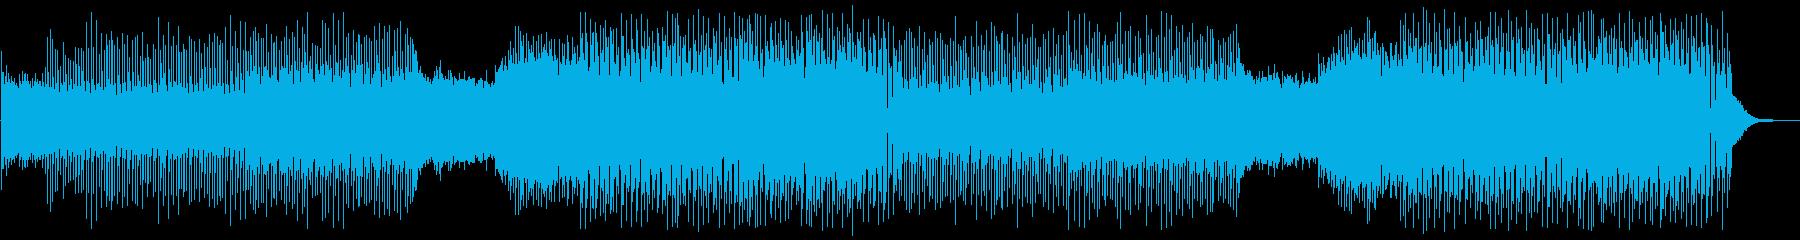 EDM 疾走感・スタイリッシュの再生済みの波形